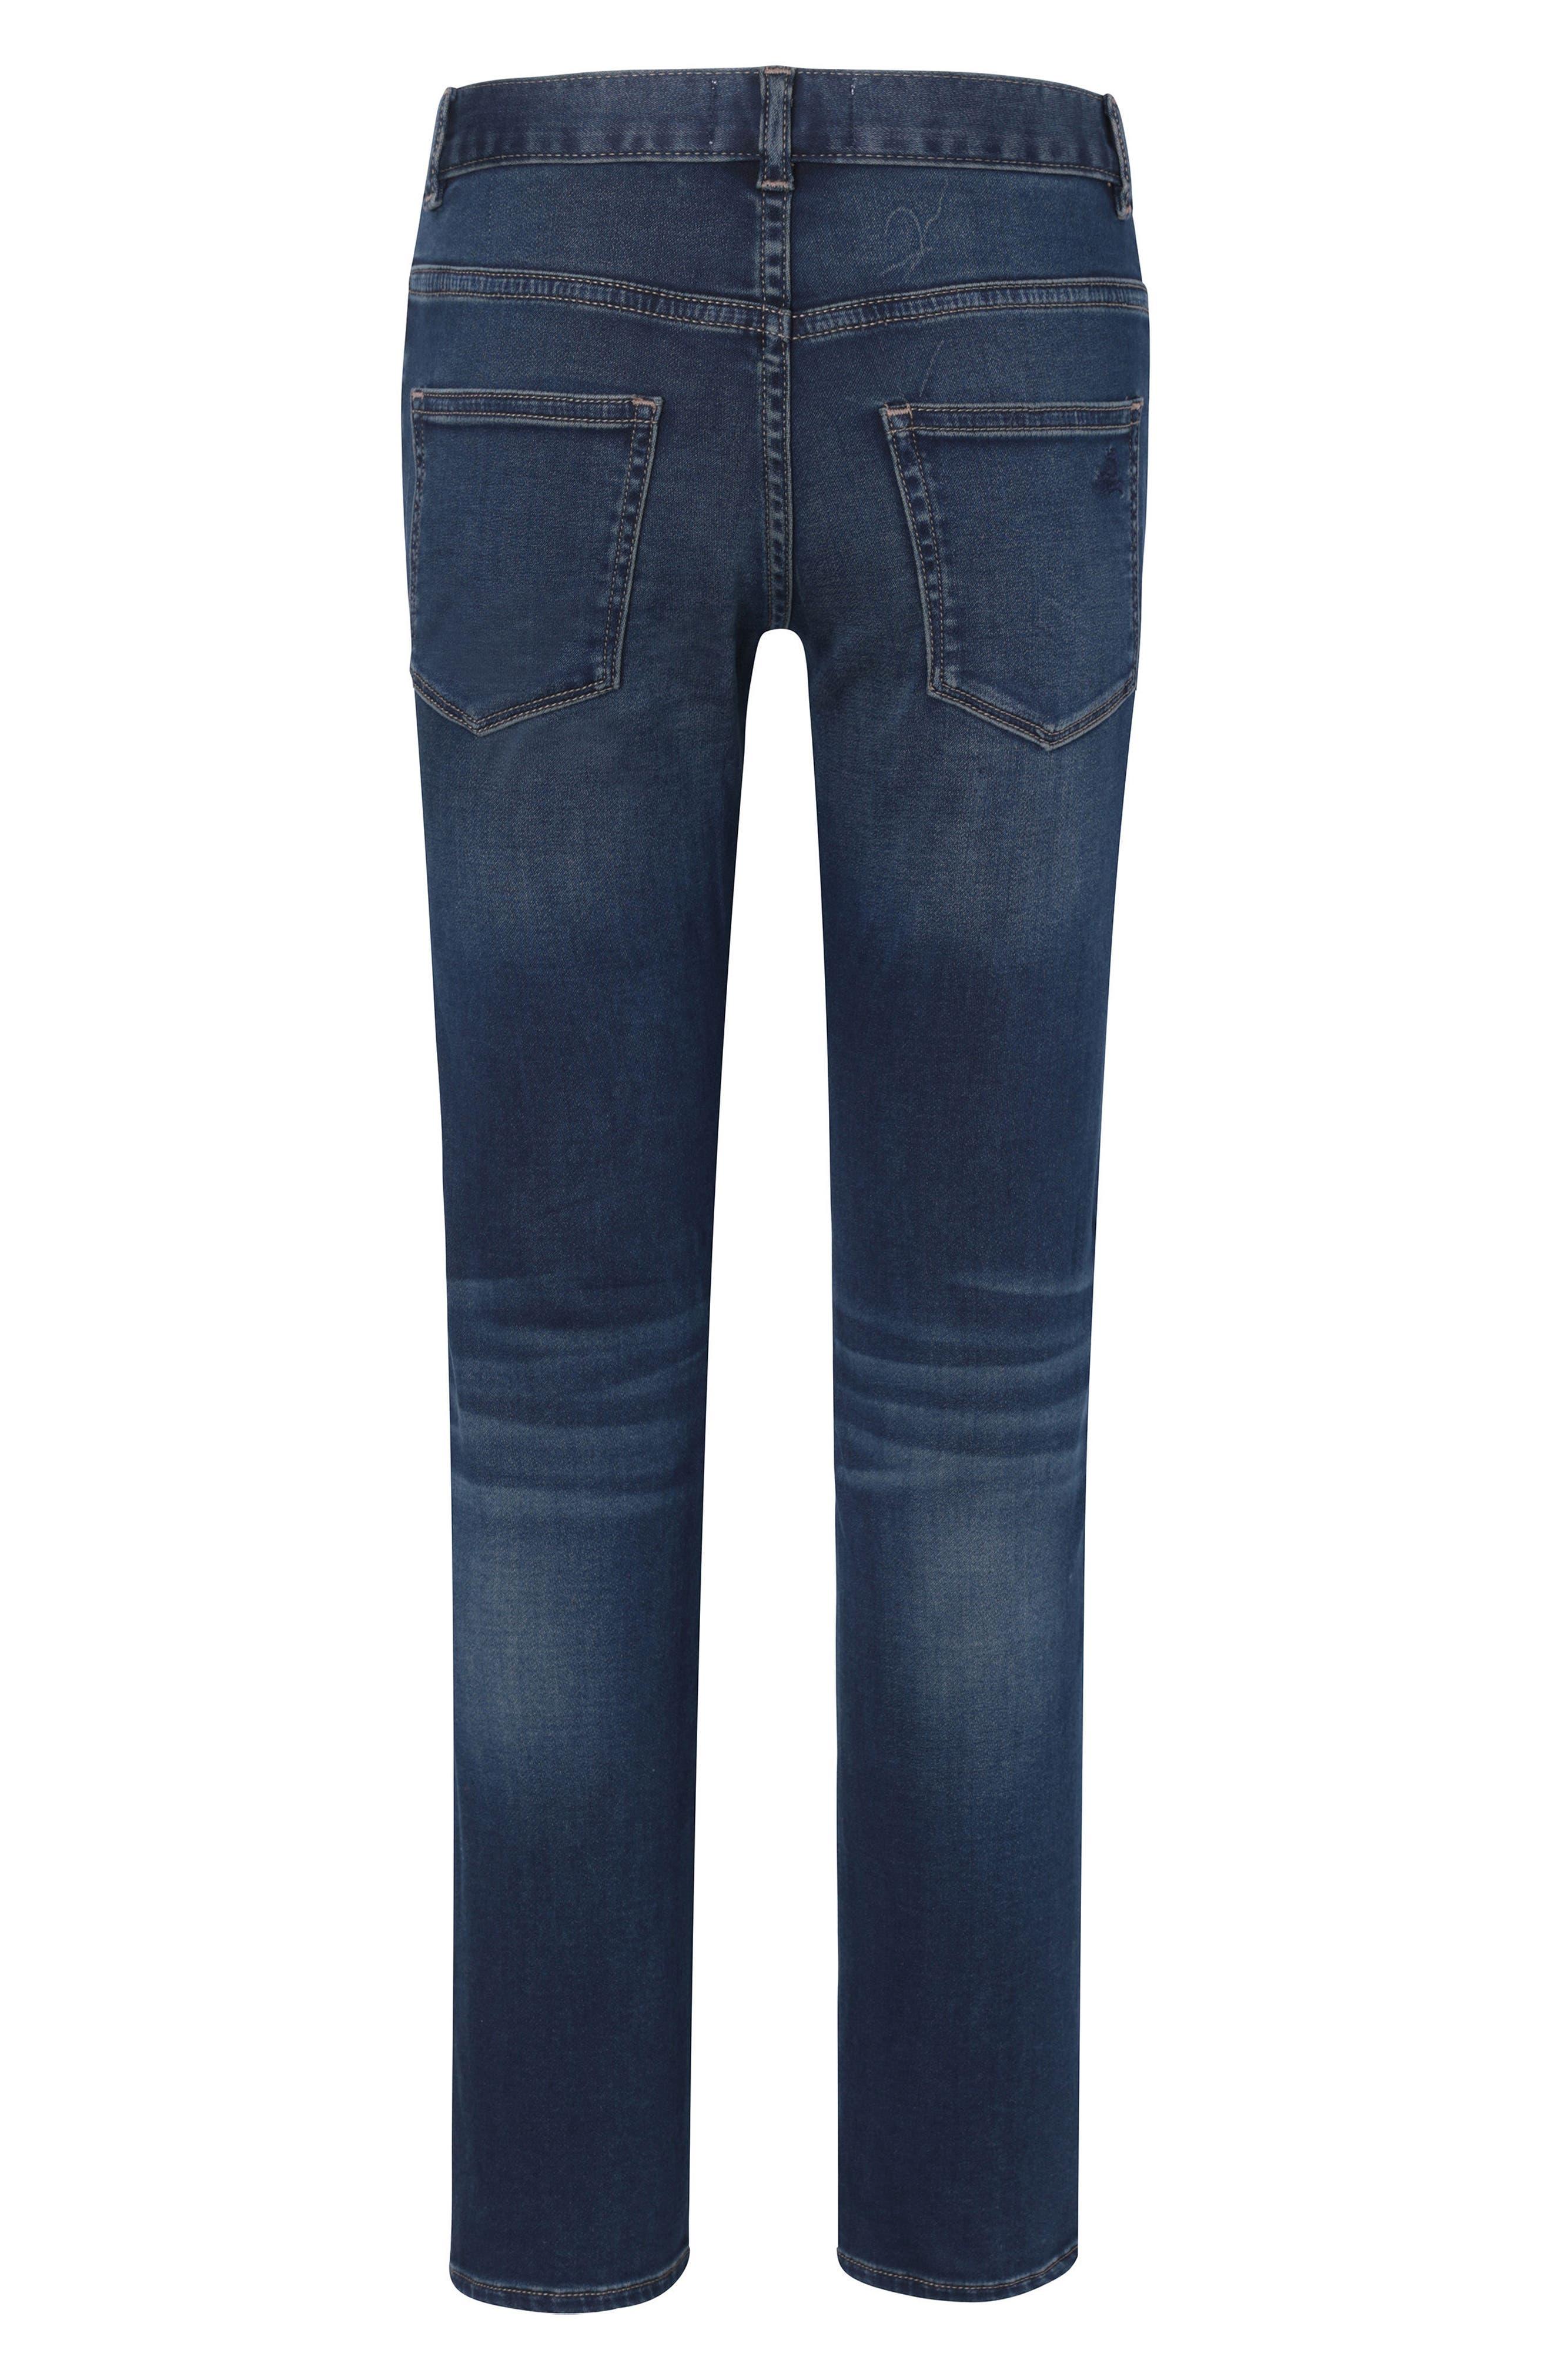 Brady Slim Straight Leg Jeans,                             Alternate thumbnail 2, color,                             VIBES